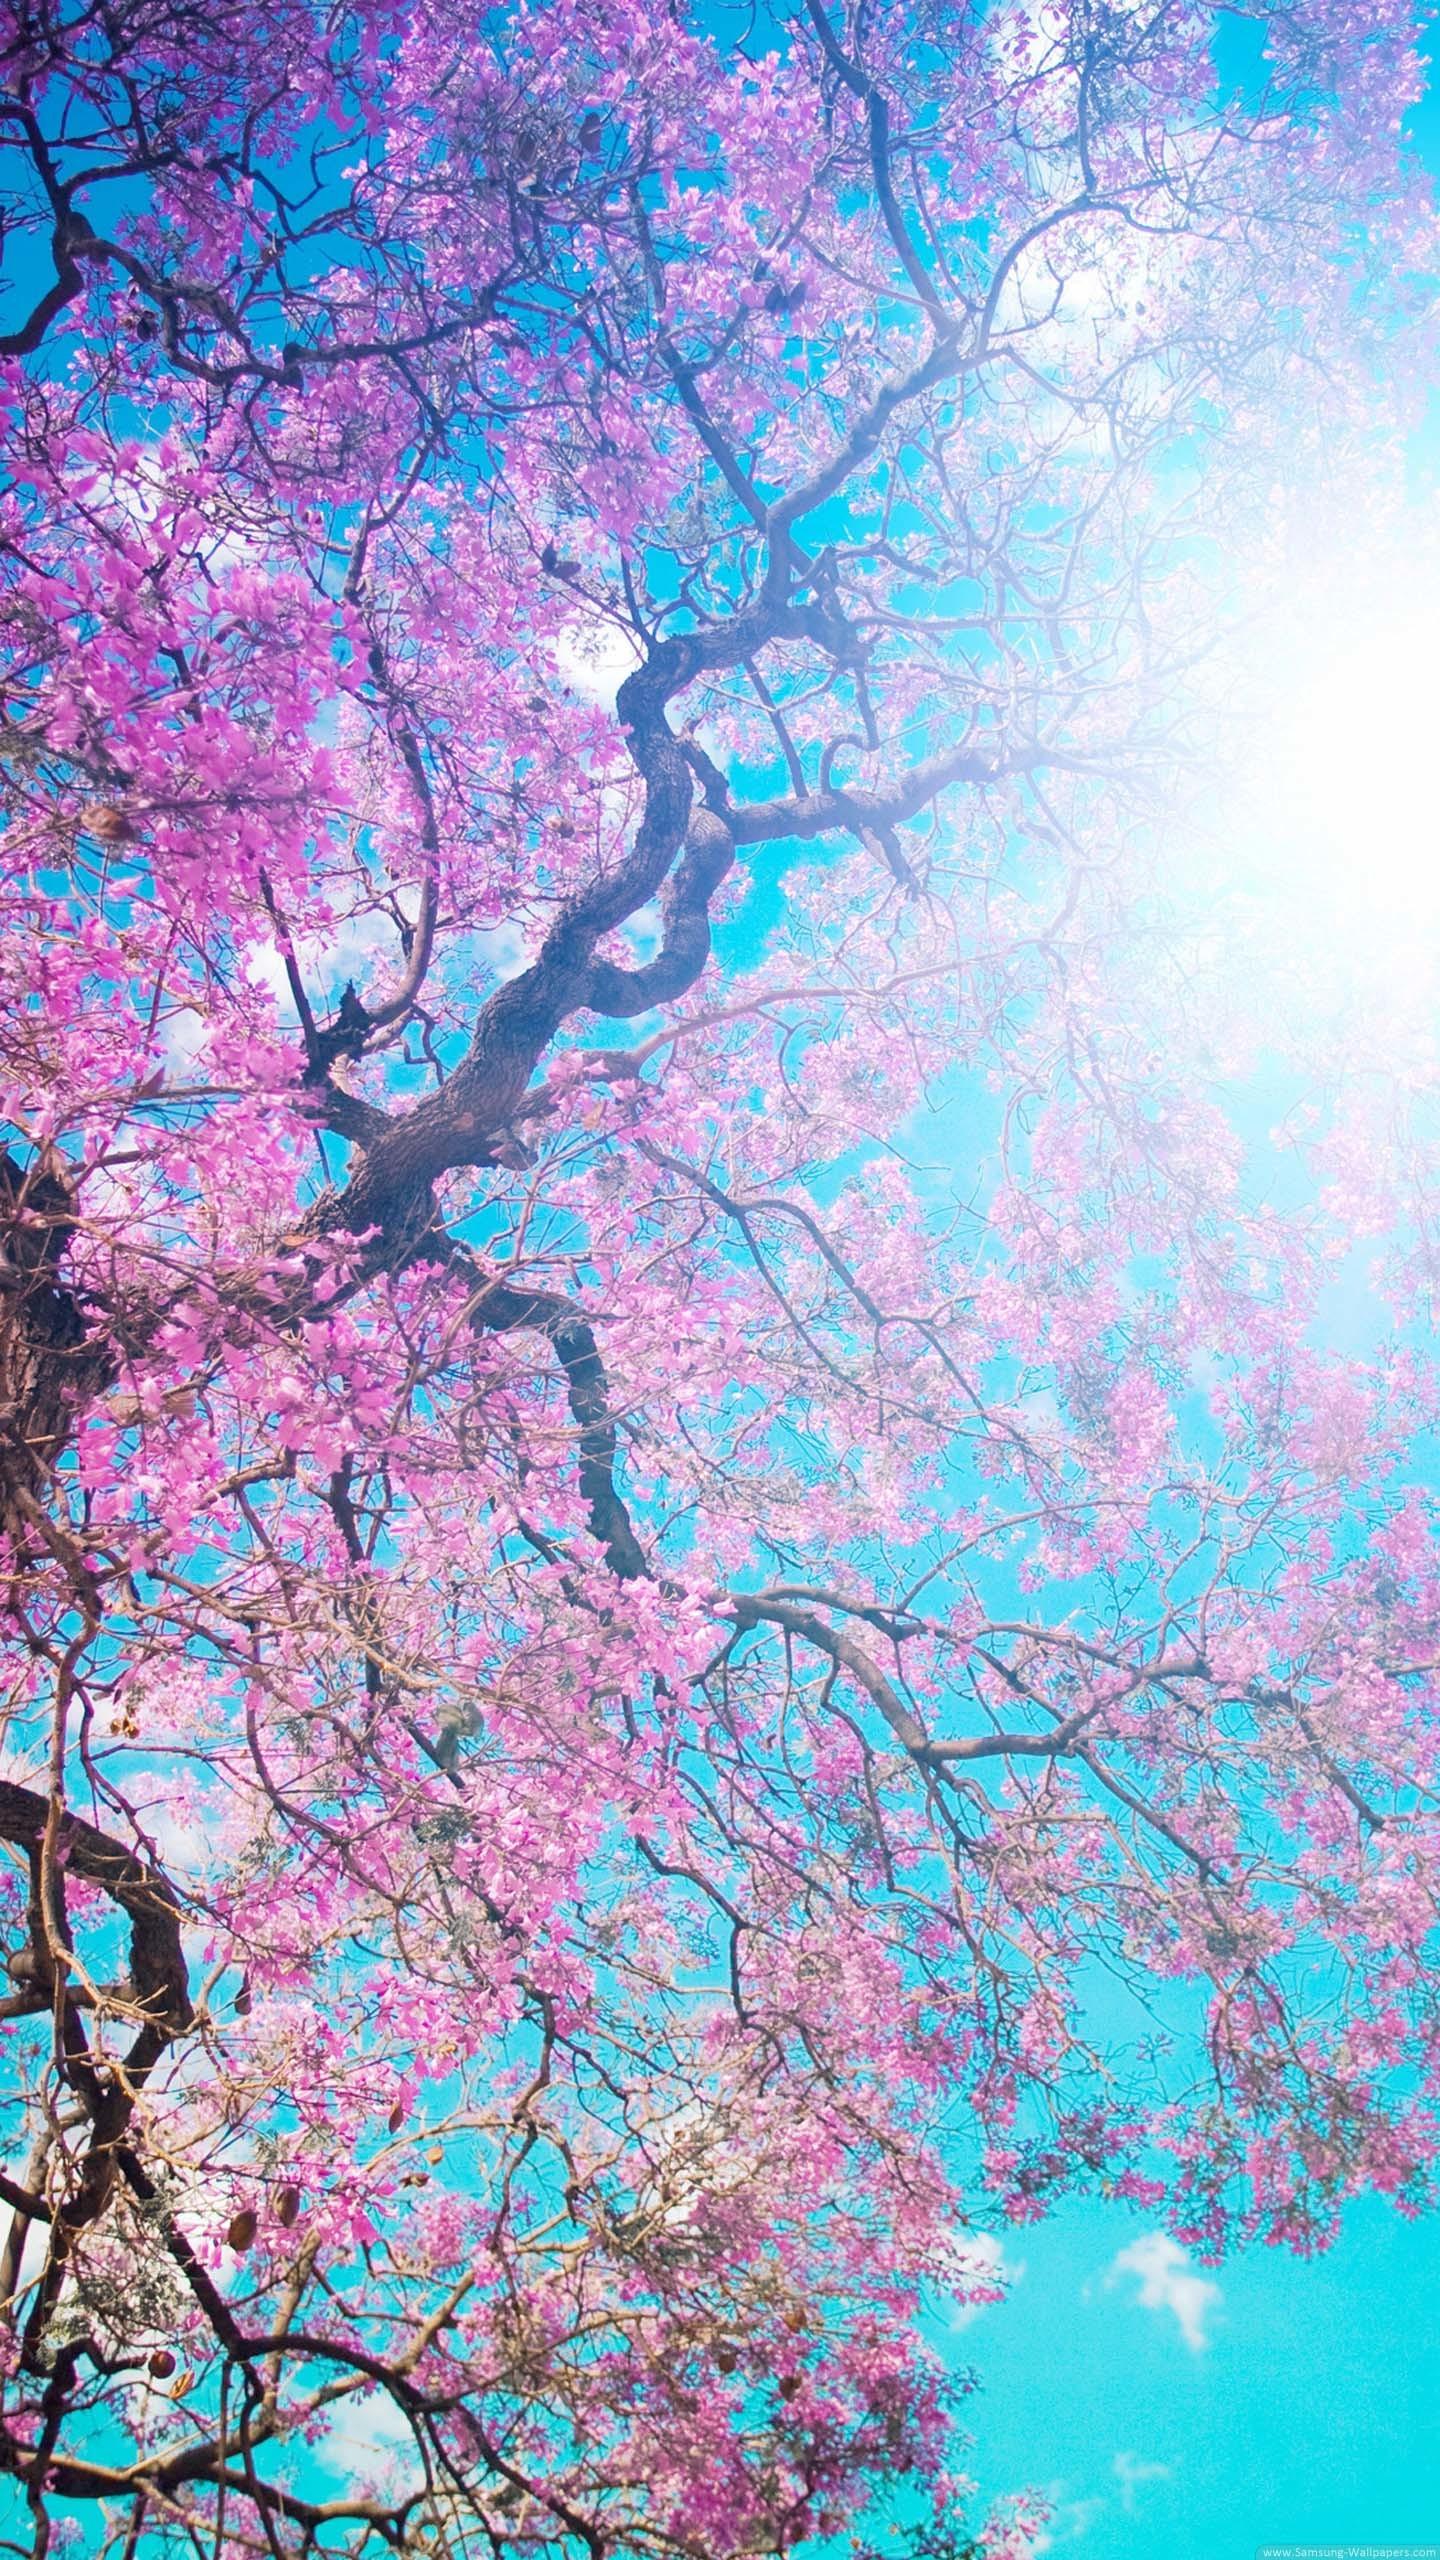 Spring Flowering Lock Screen Samsung Galaxy S5 Wallpaper HD